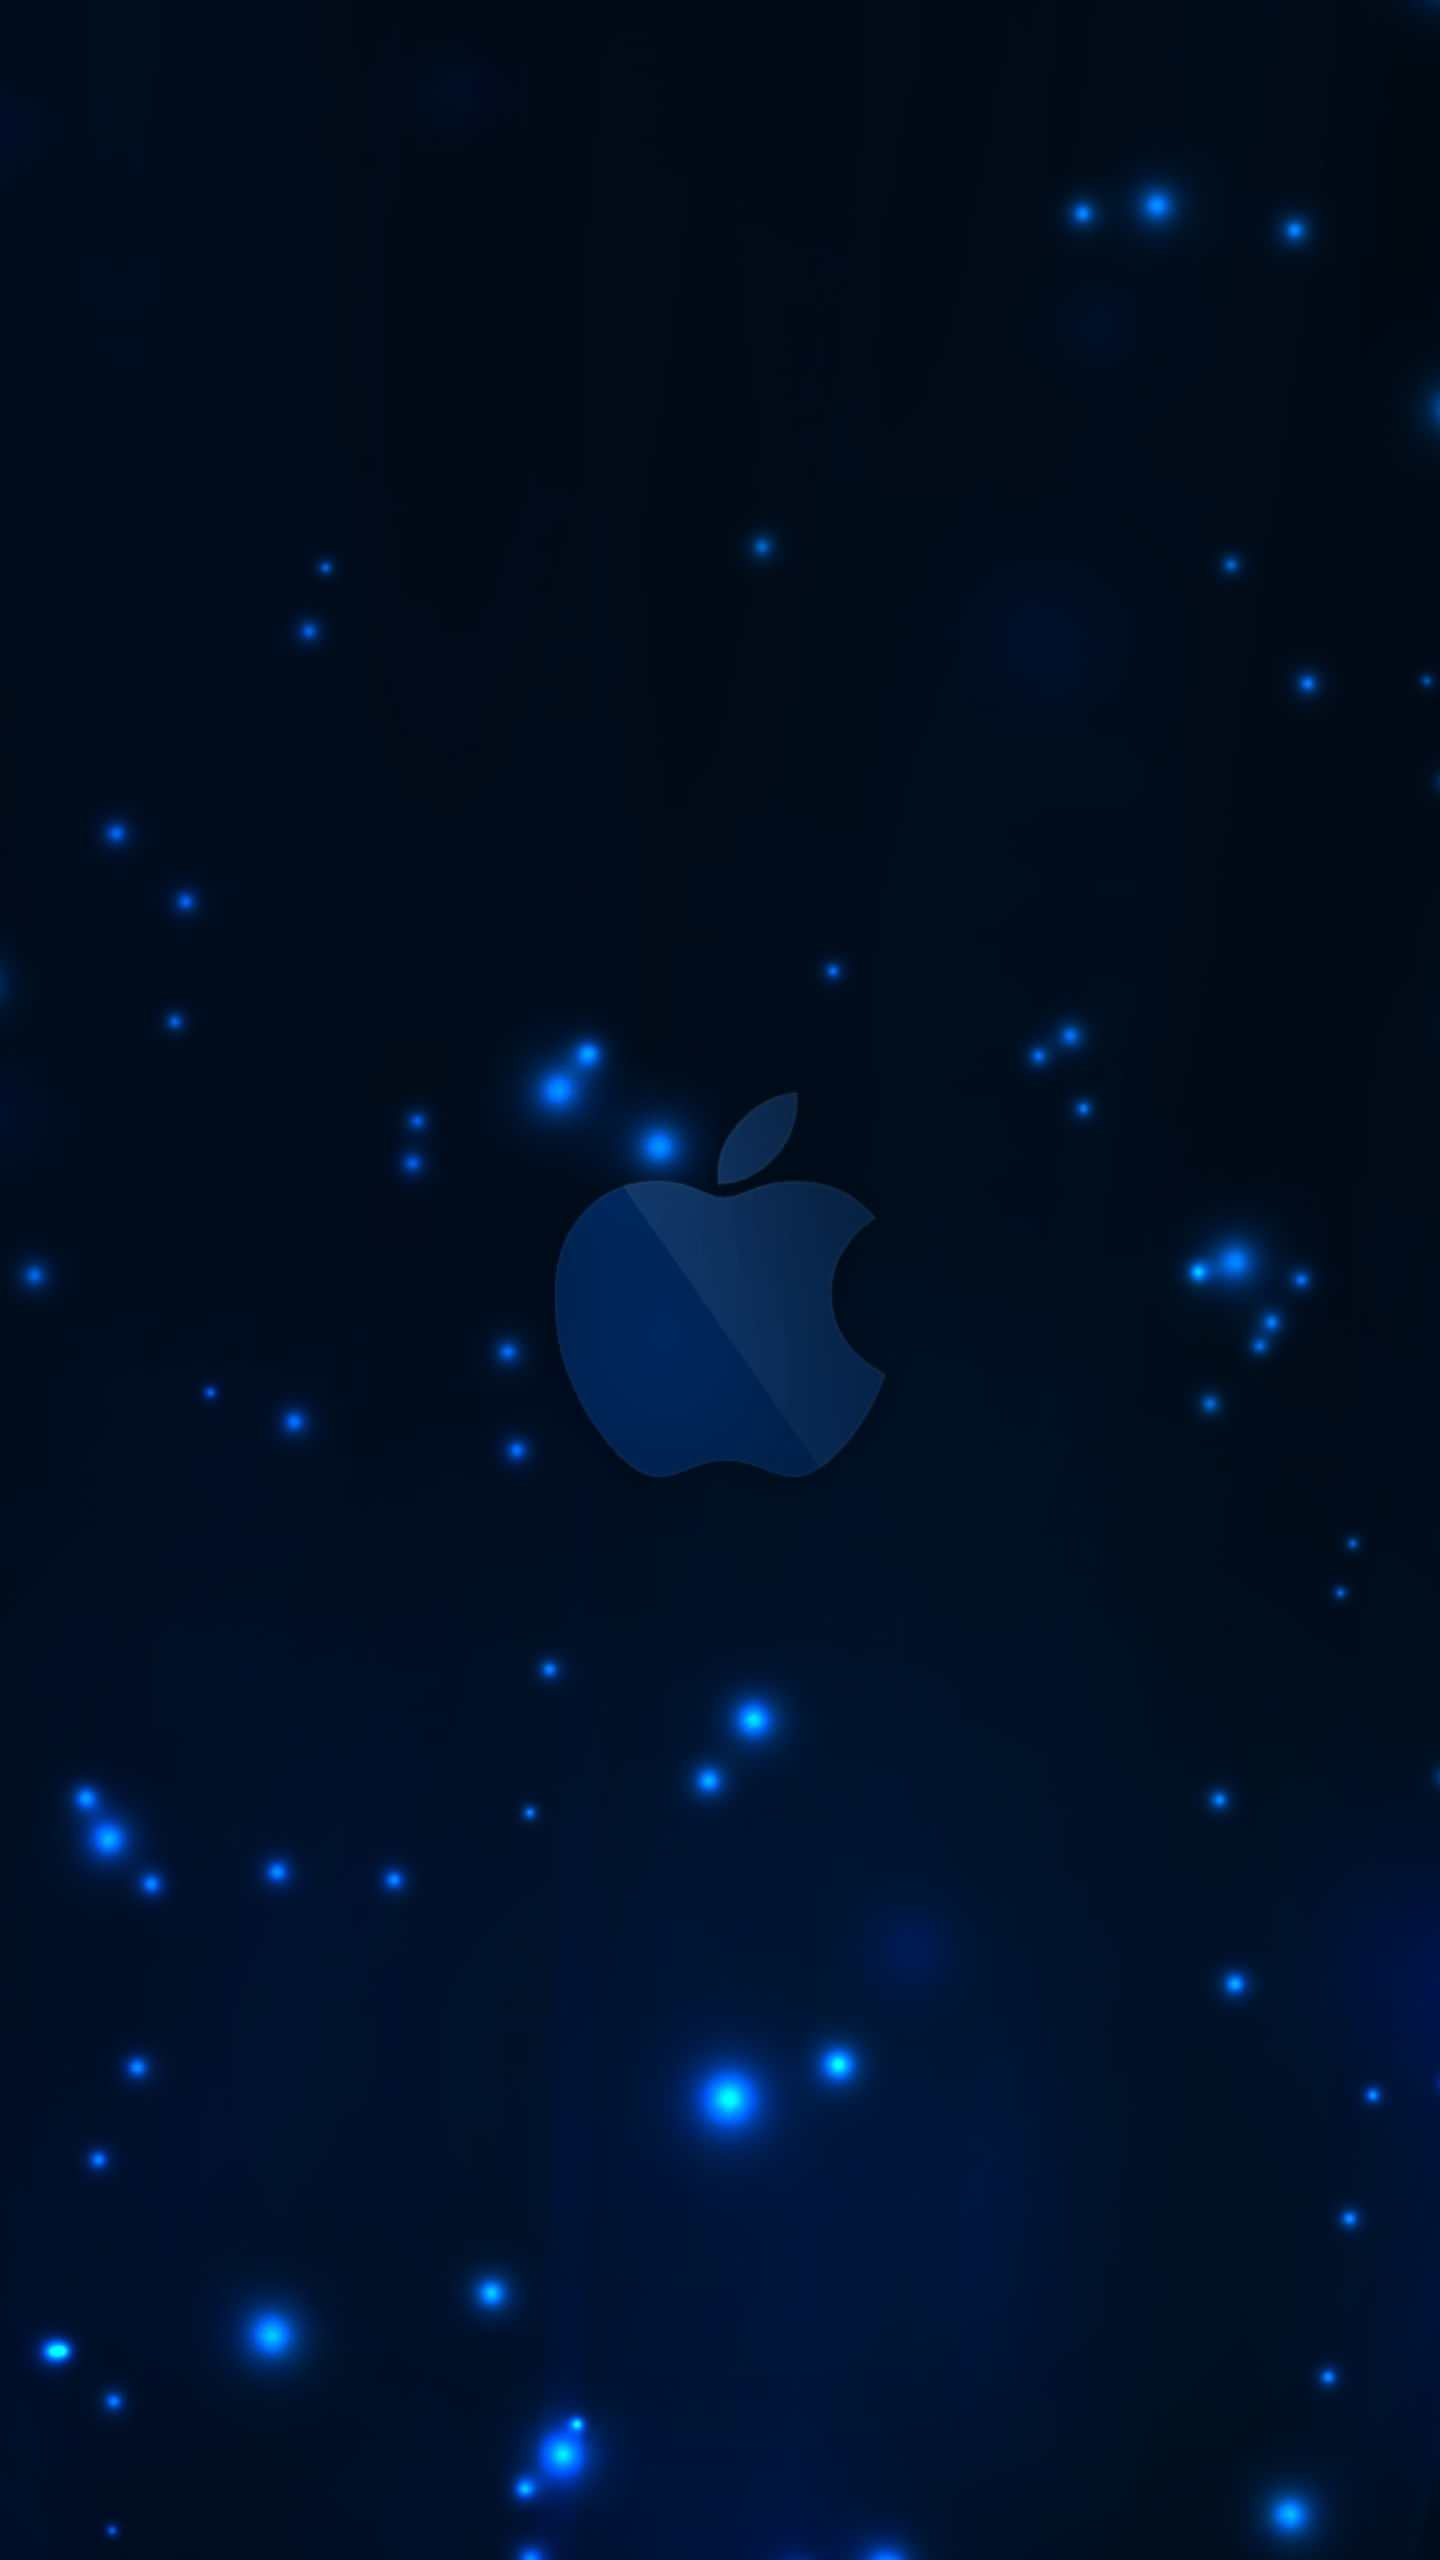 apple blue smartphone